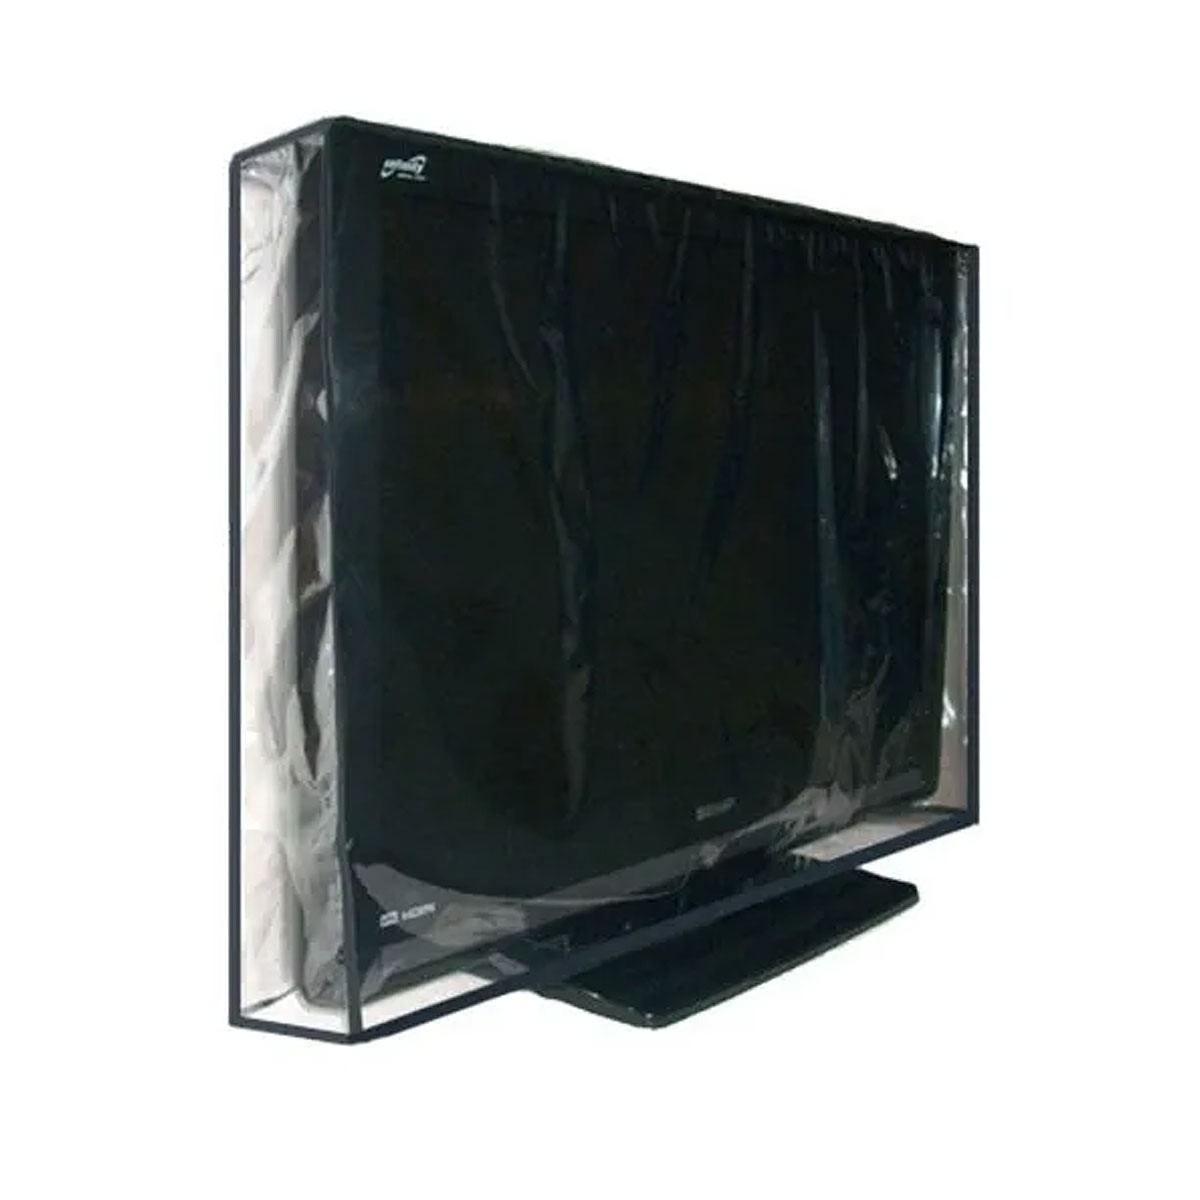 Capa Para Tv Lcd 50 Pvc Cristal - Aberta P/ Suporte